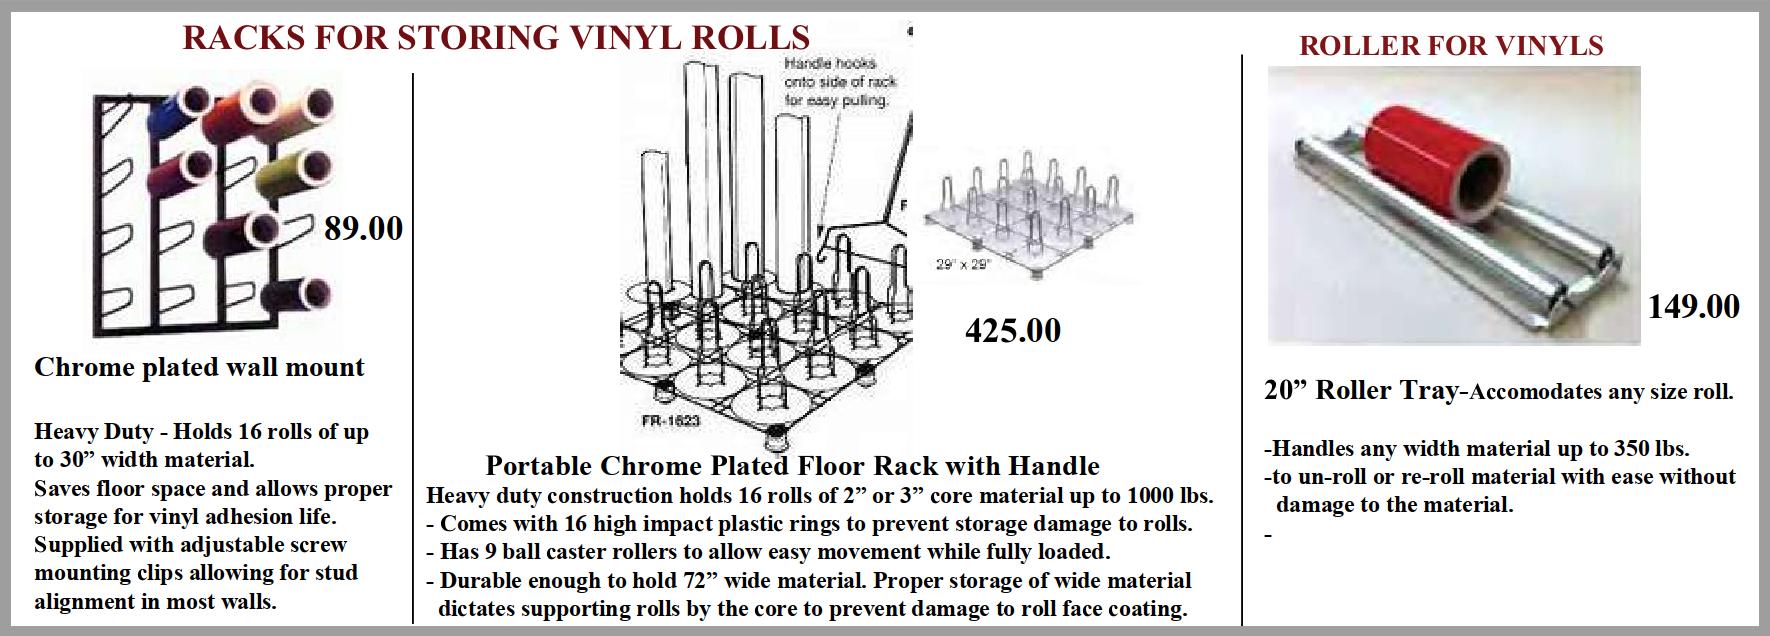 racks vinyl - Racks - Vinyl Storage